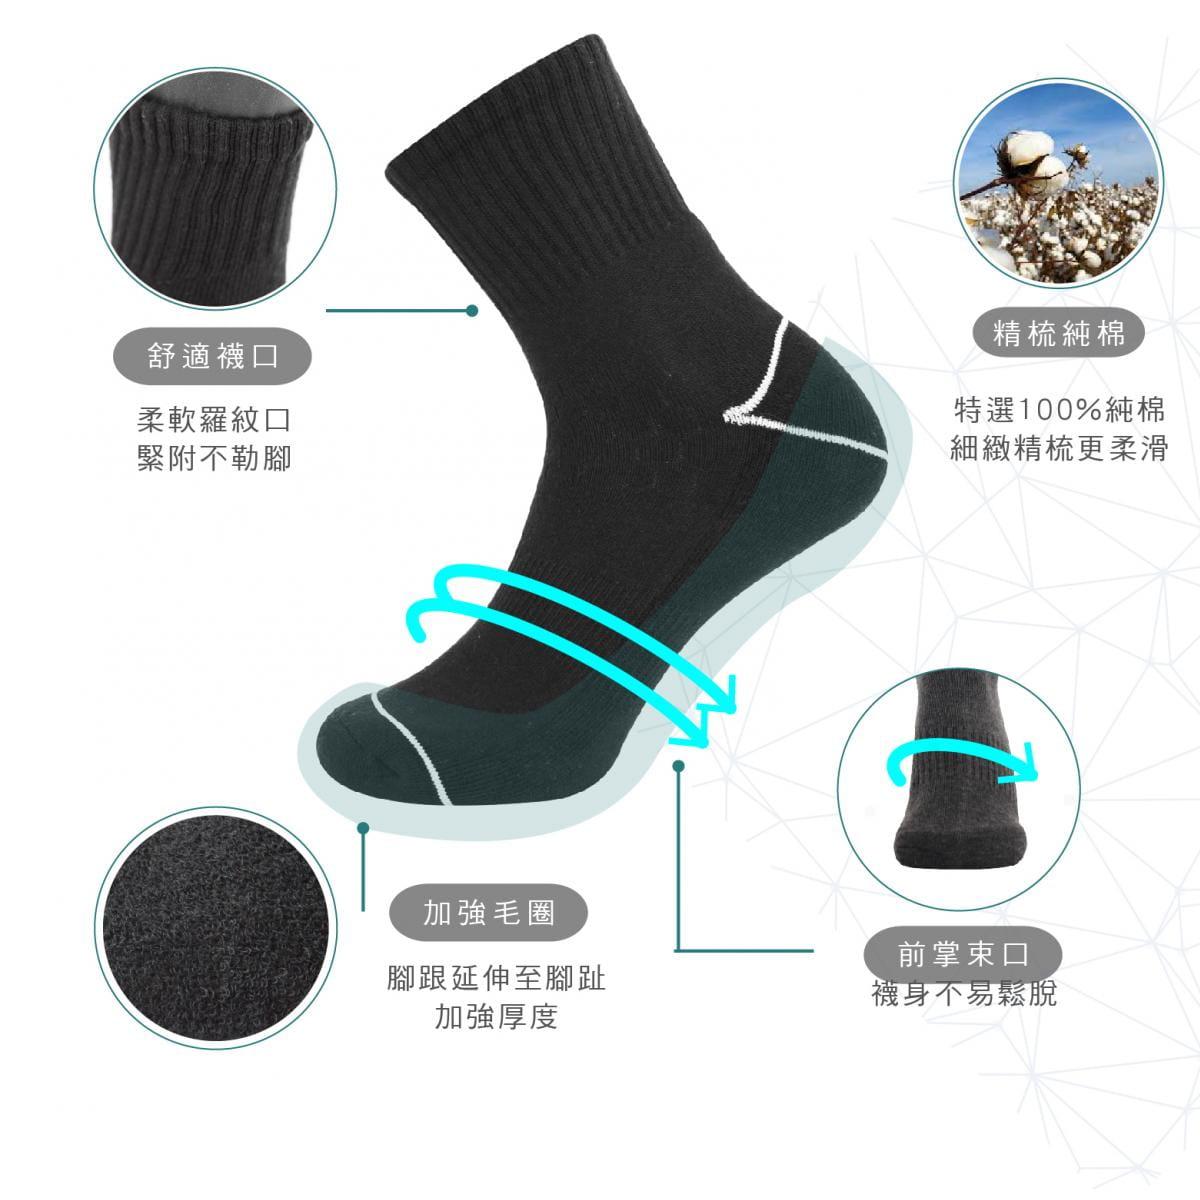 【FAV】加大尺碼男襪 1